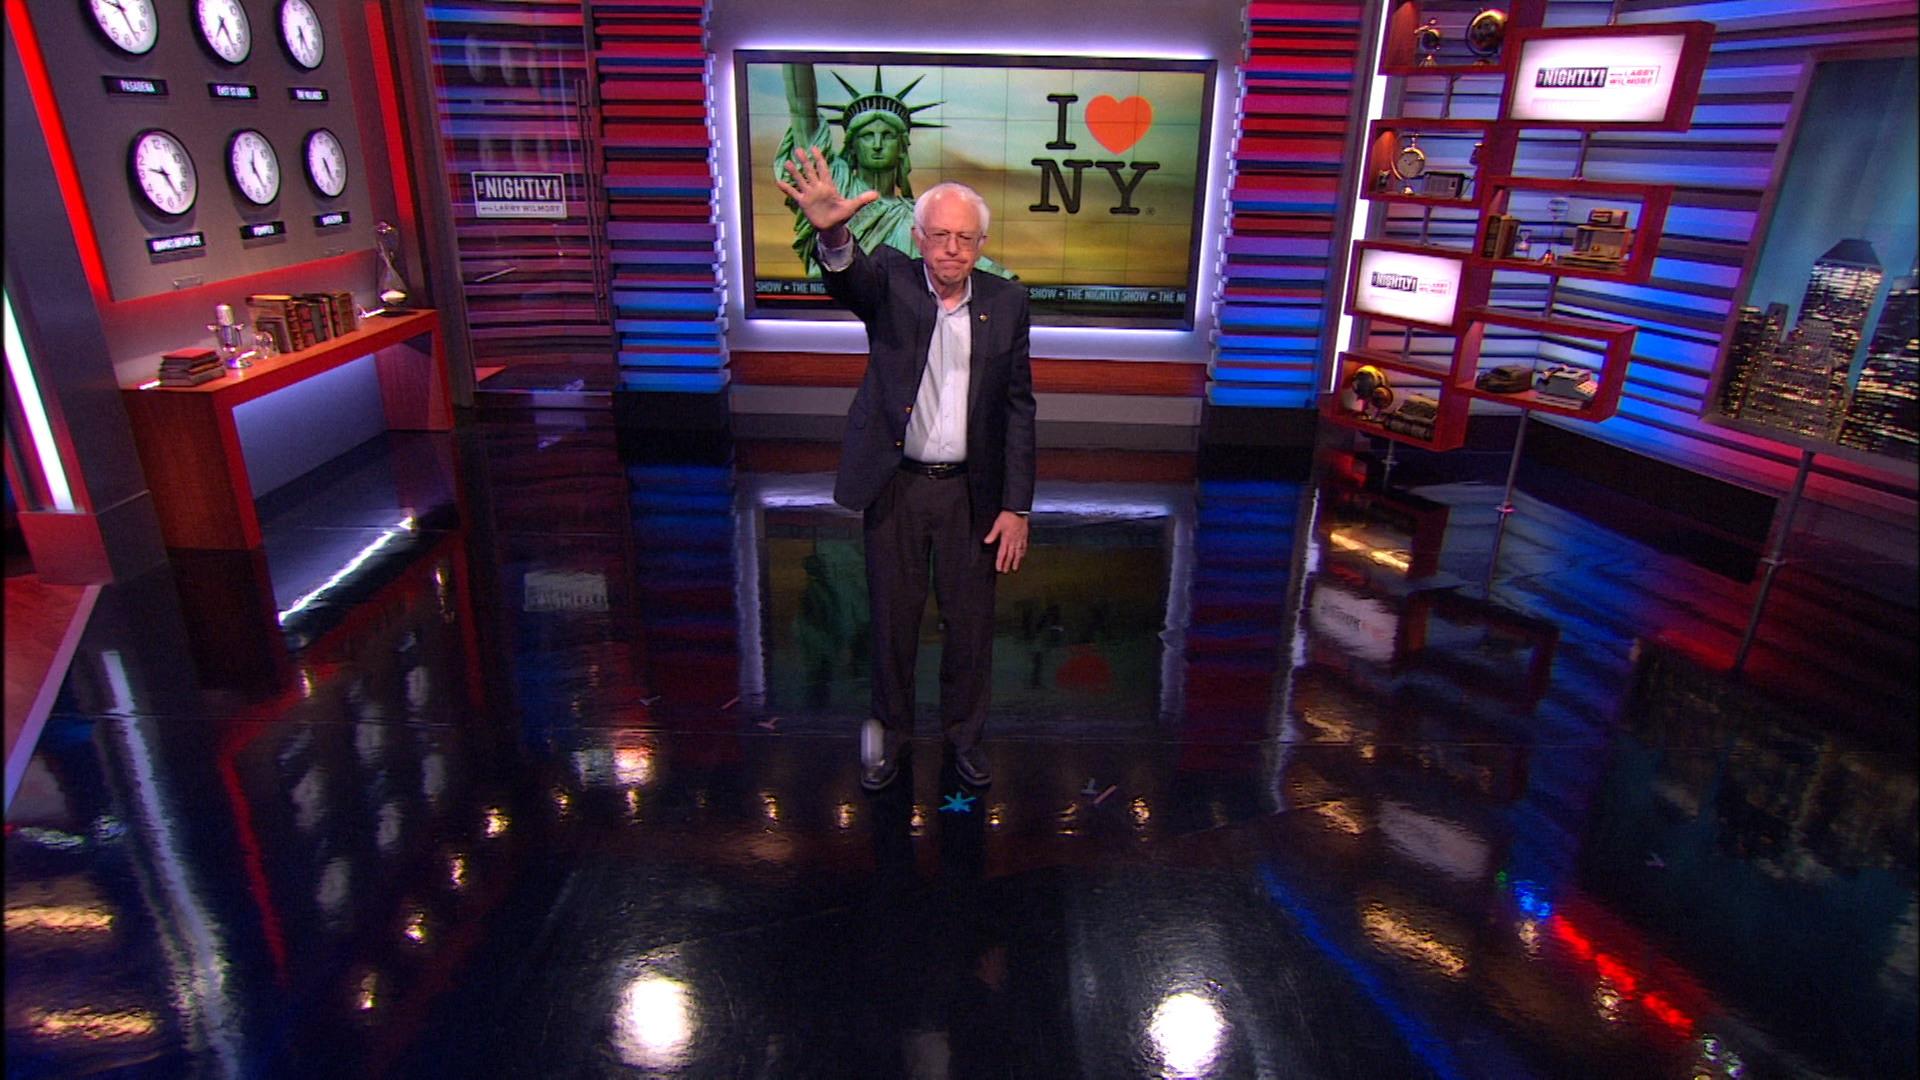 April 13, 2016 - Bernie Sanders